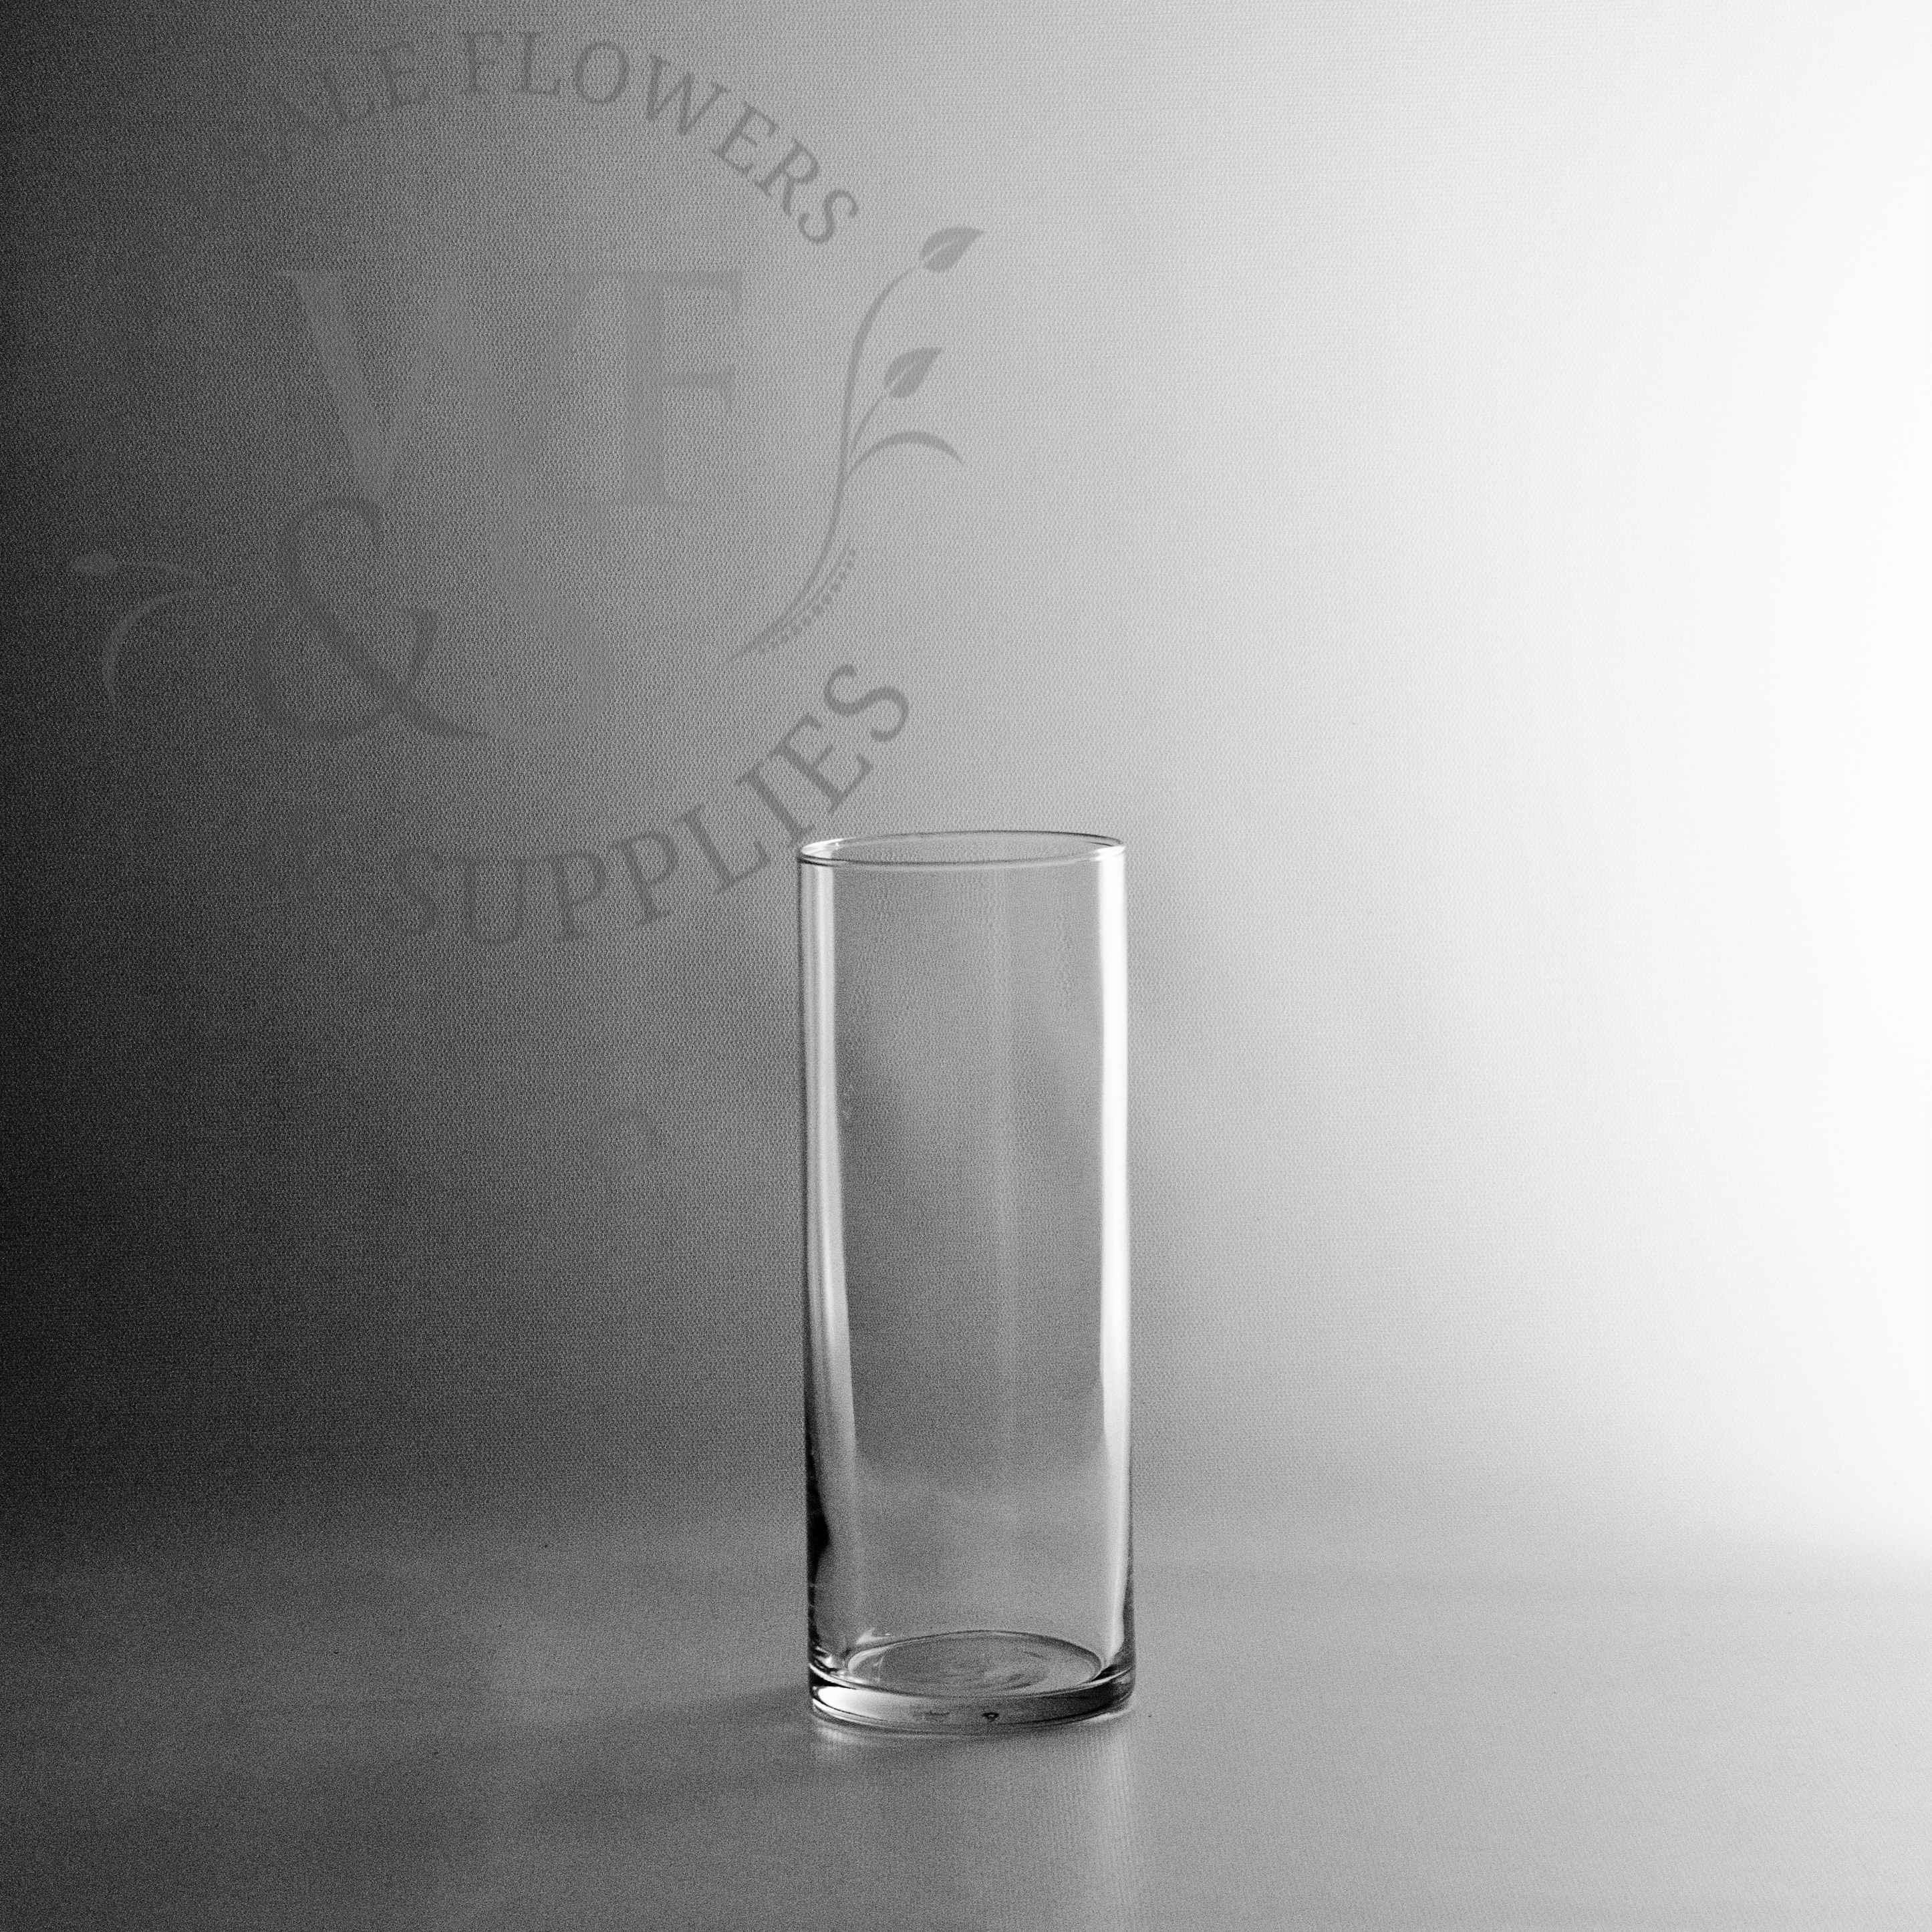 libbey clear cylinder bud vase of glass cylinder vases wholesale flowers supplies intended for 9 x 3 25 glass cylinder vase